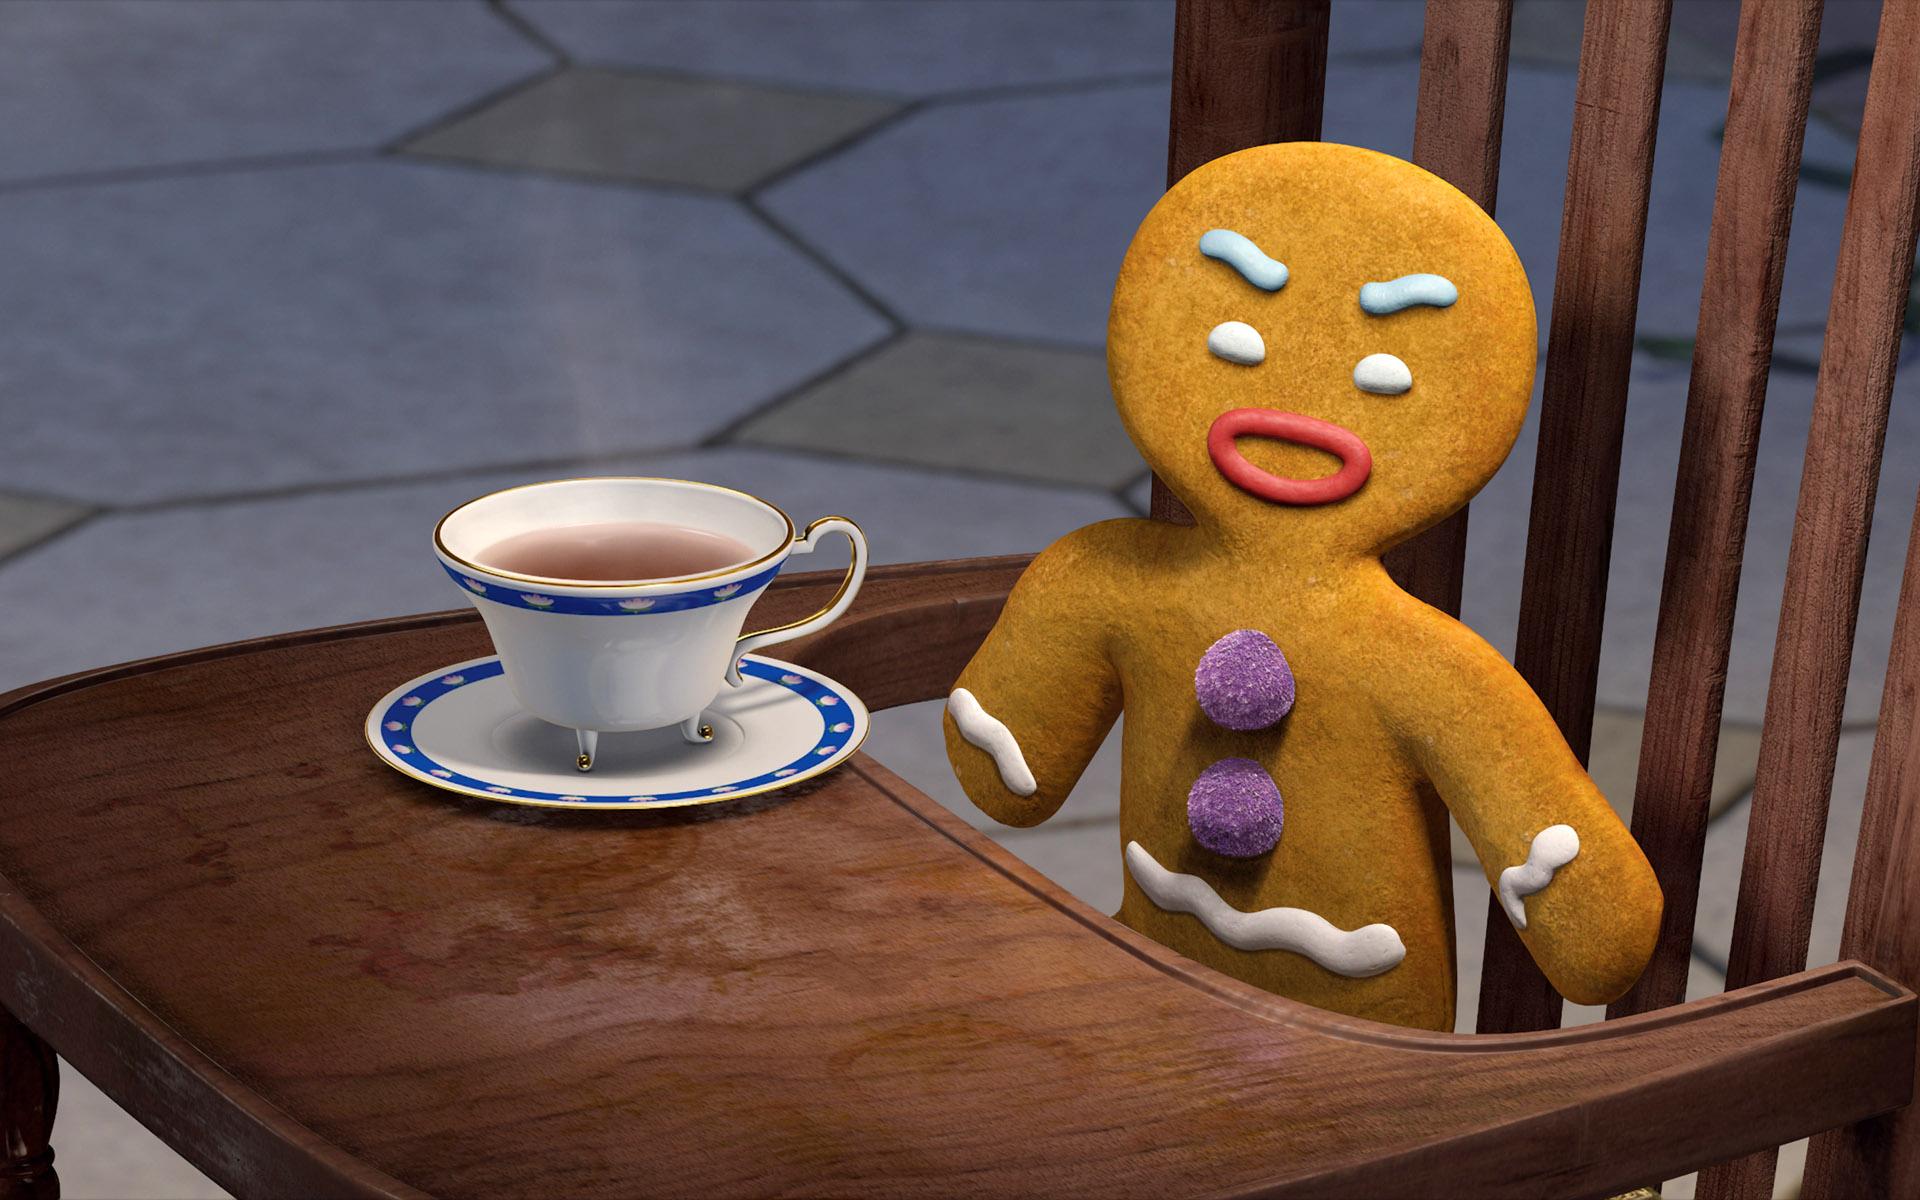 list of shrek characters dreamworks animation wiki fandom powered by wikia. Black Bedroom Furniture Sets. Home Design Ideas